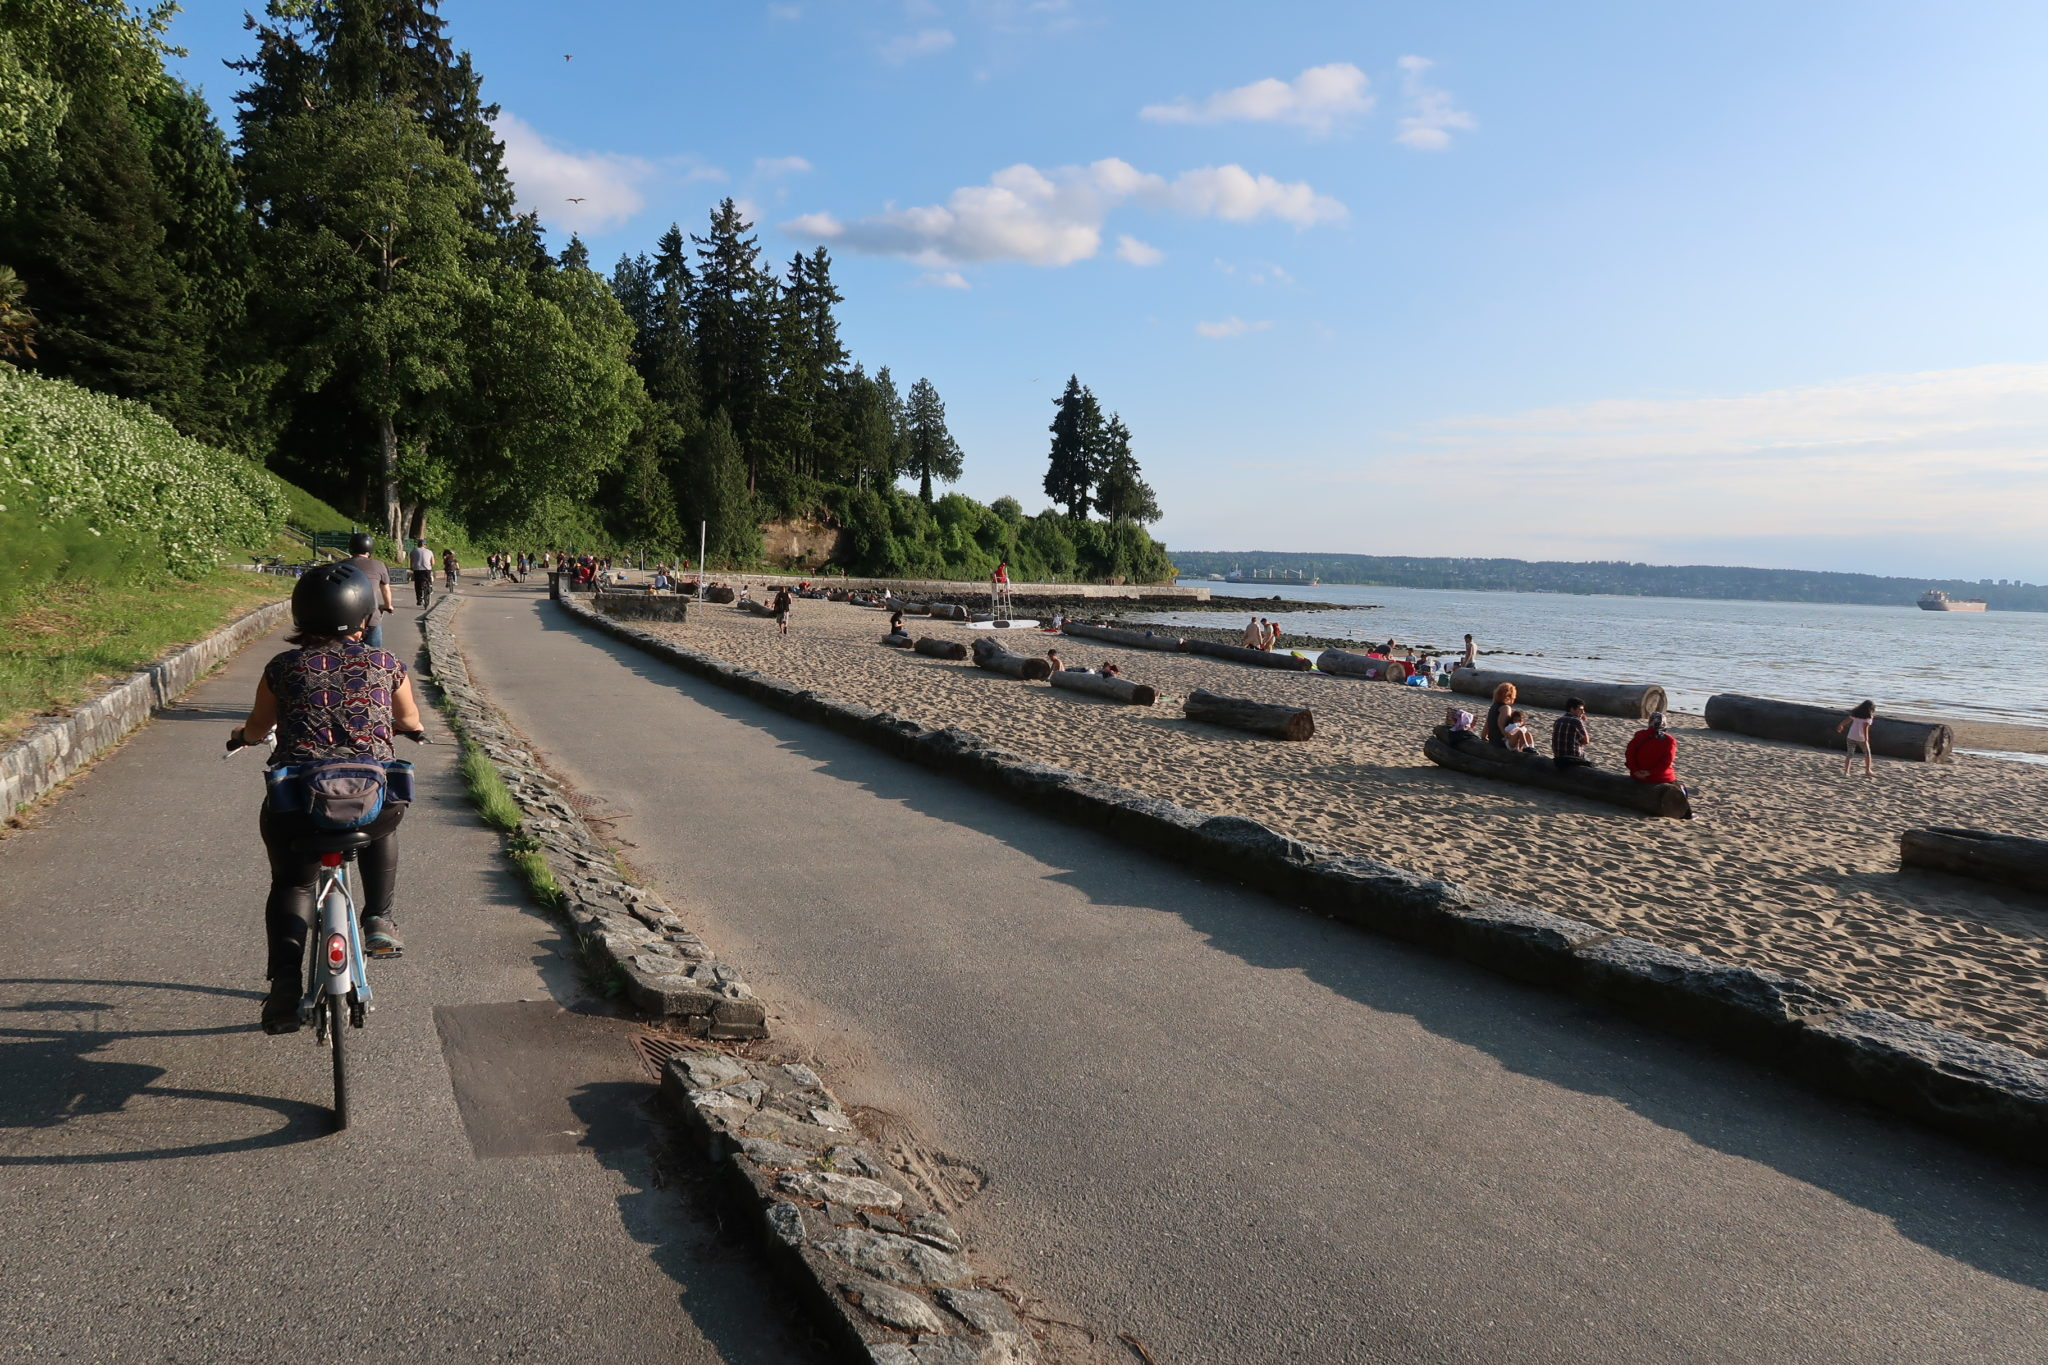 Promenade en vélo, Parc Stanley, Vancouver (mai 2018).